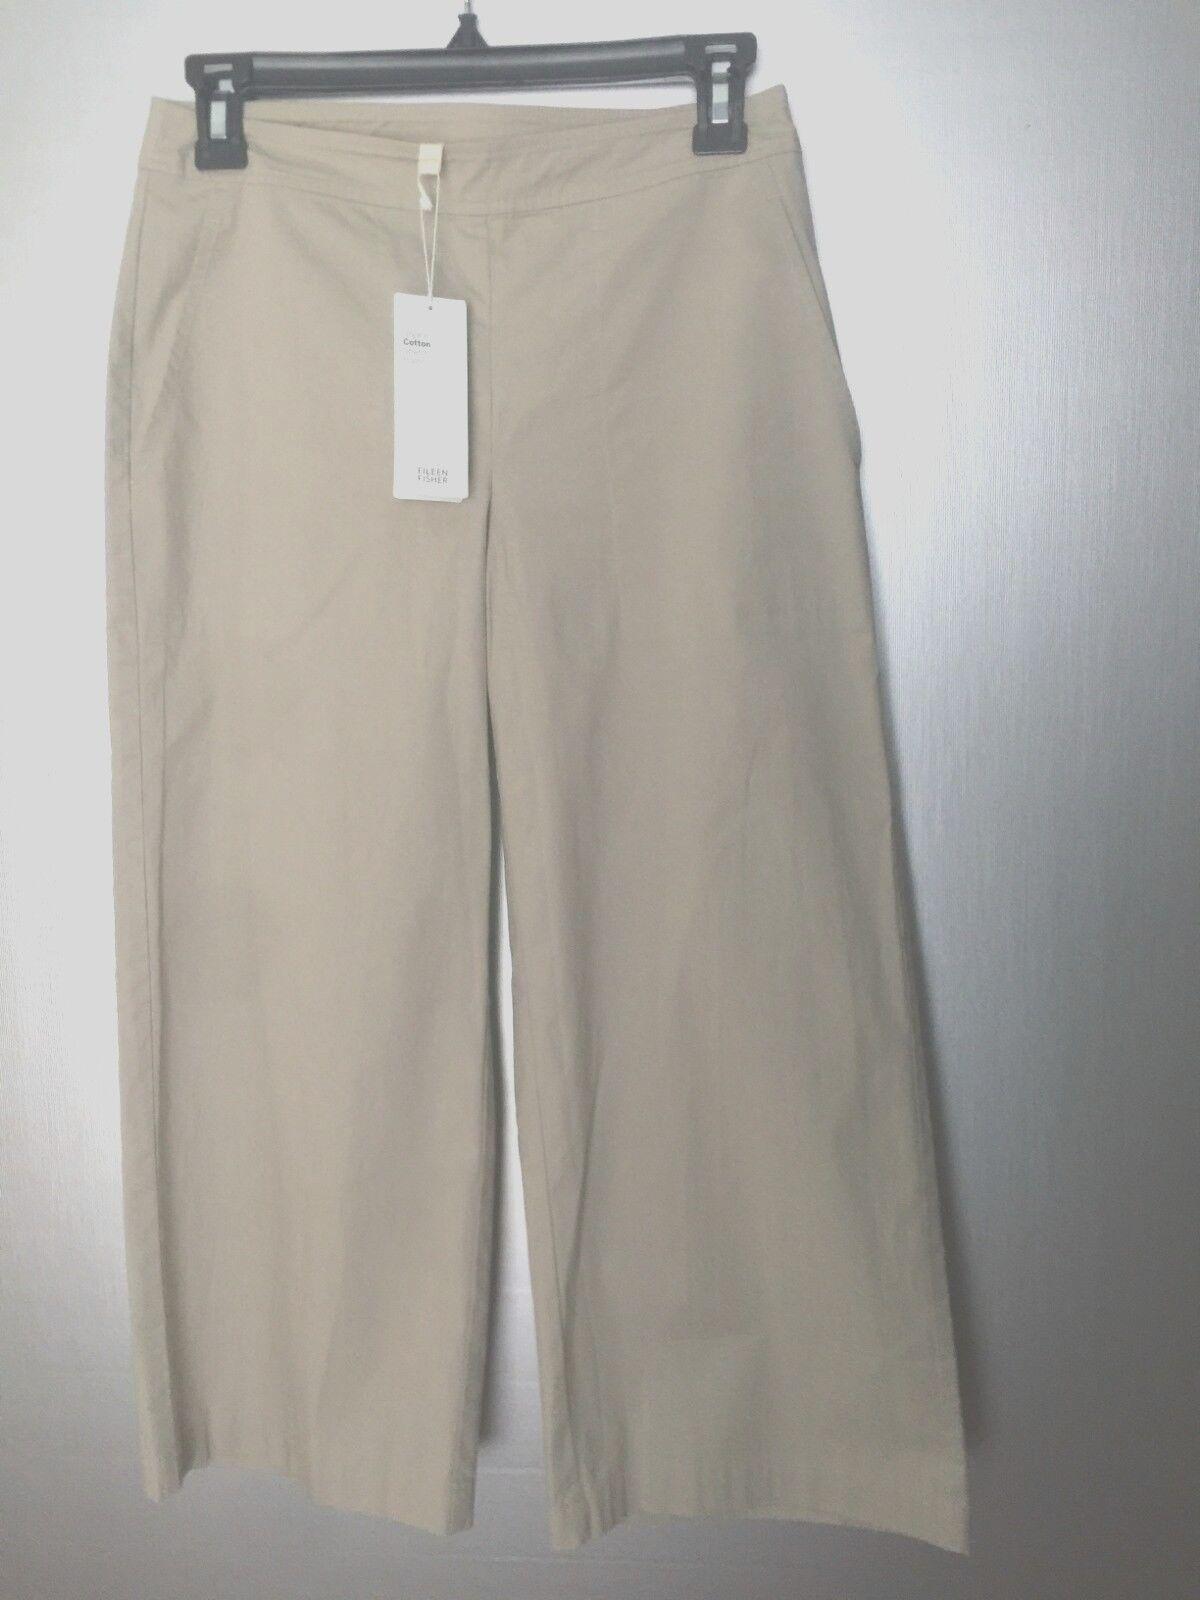 Eileen Fisher Pebble Organic Cotton Stretch Poplin Wide Leg Crop Pants Petite PP